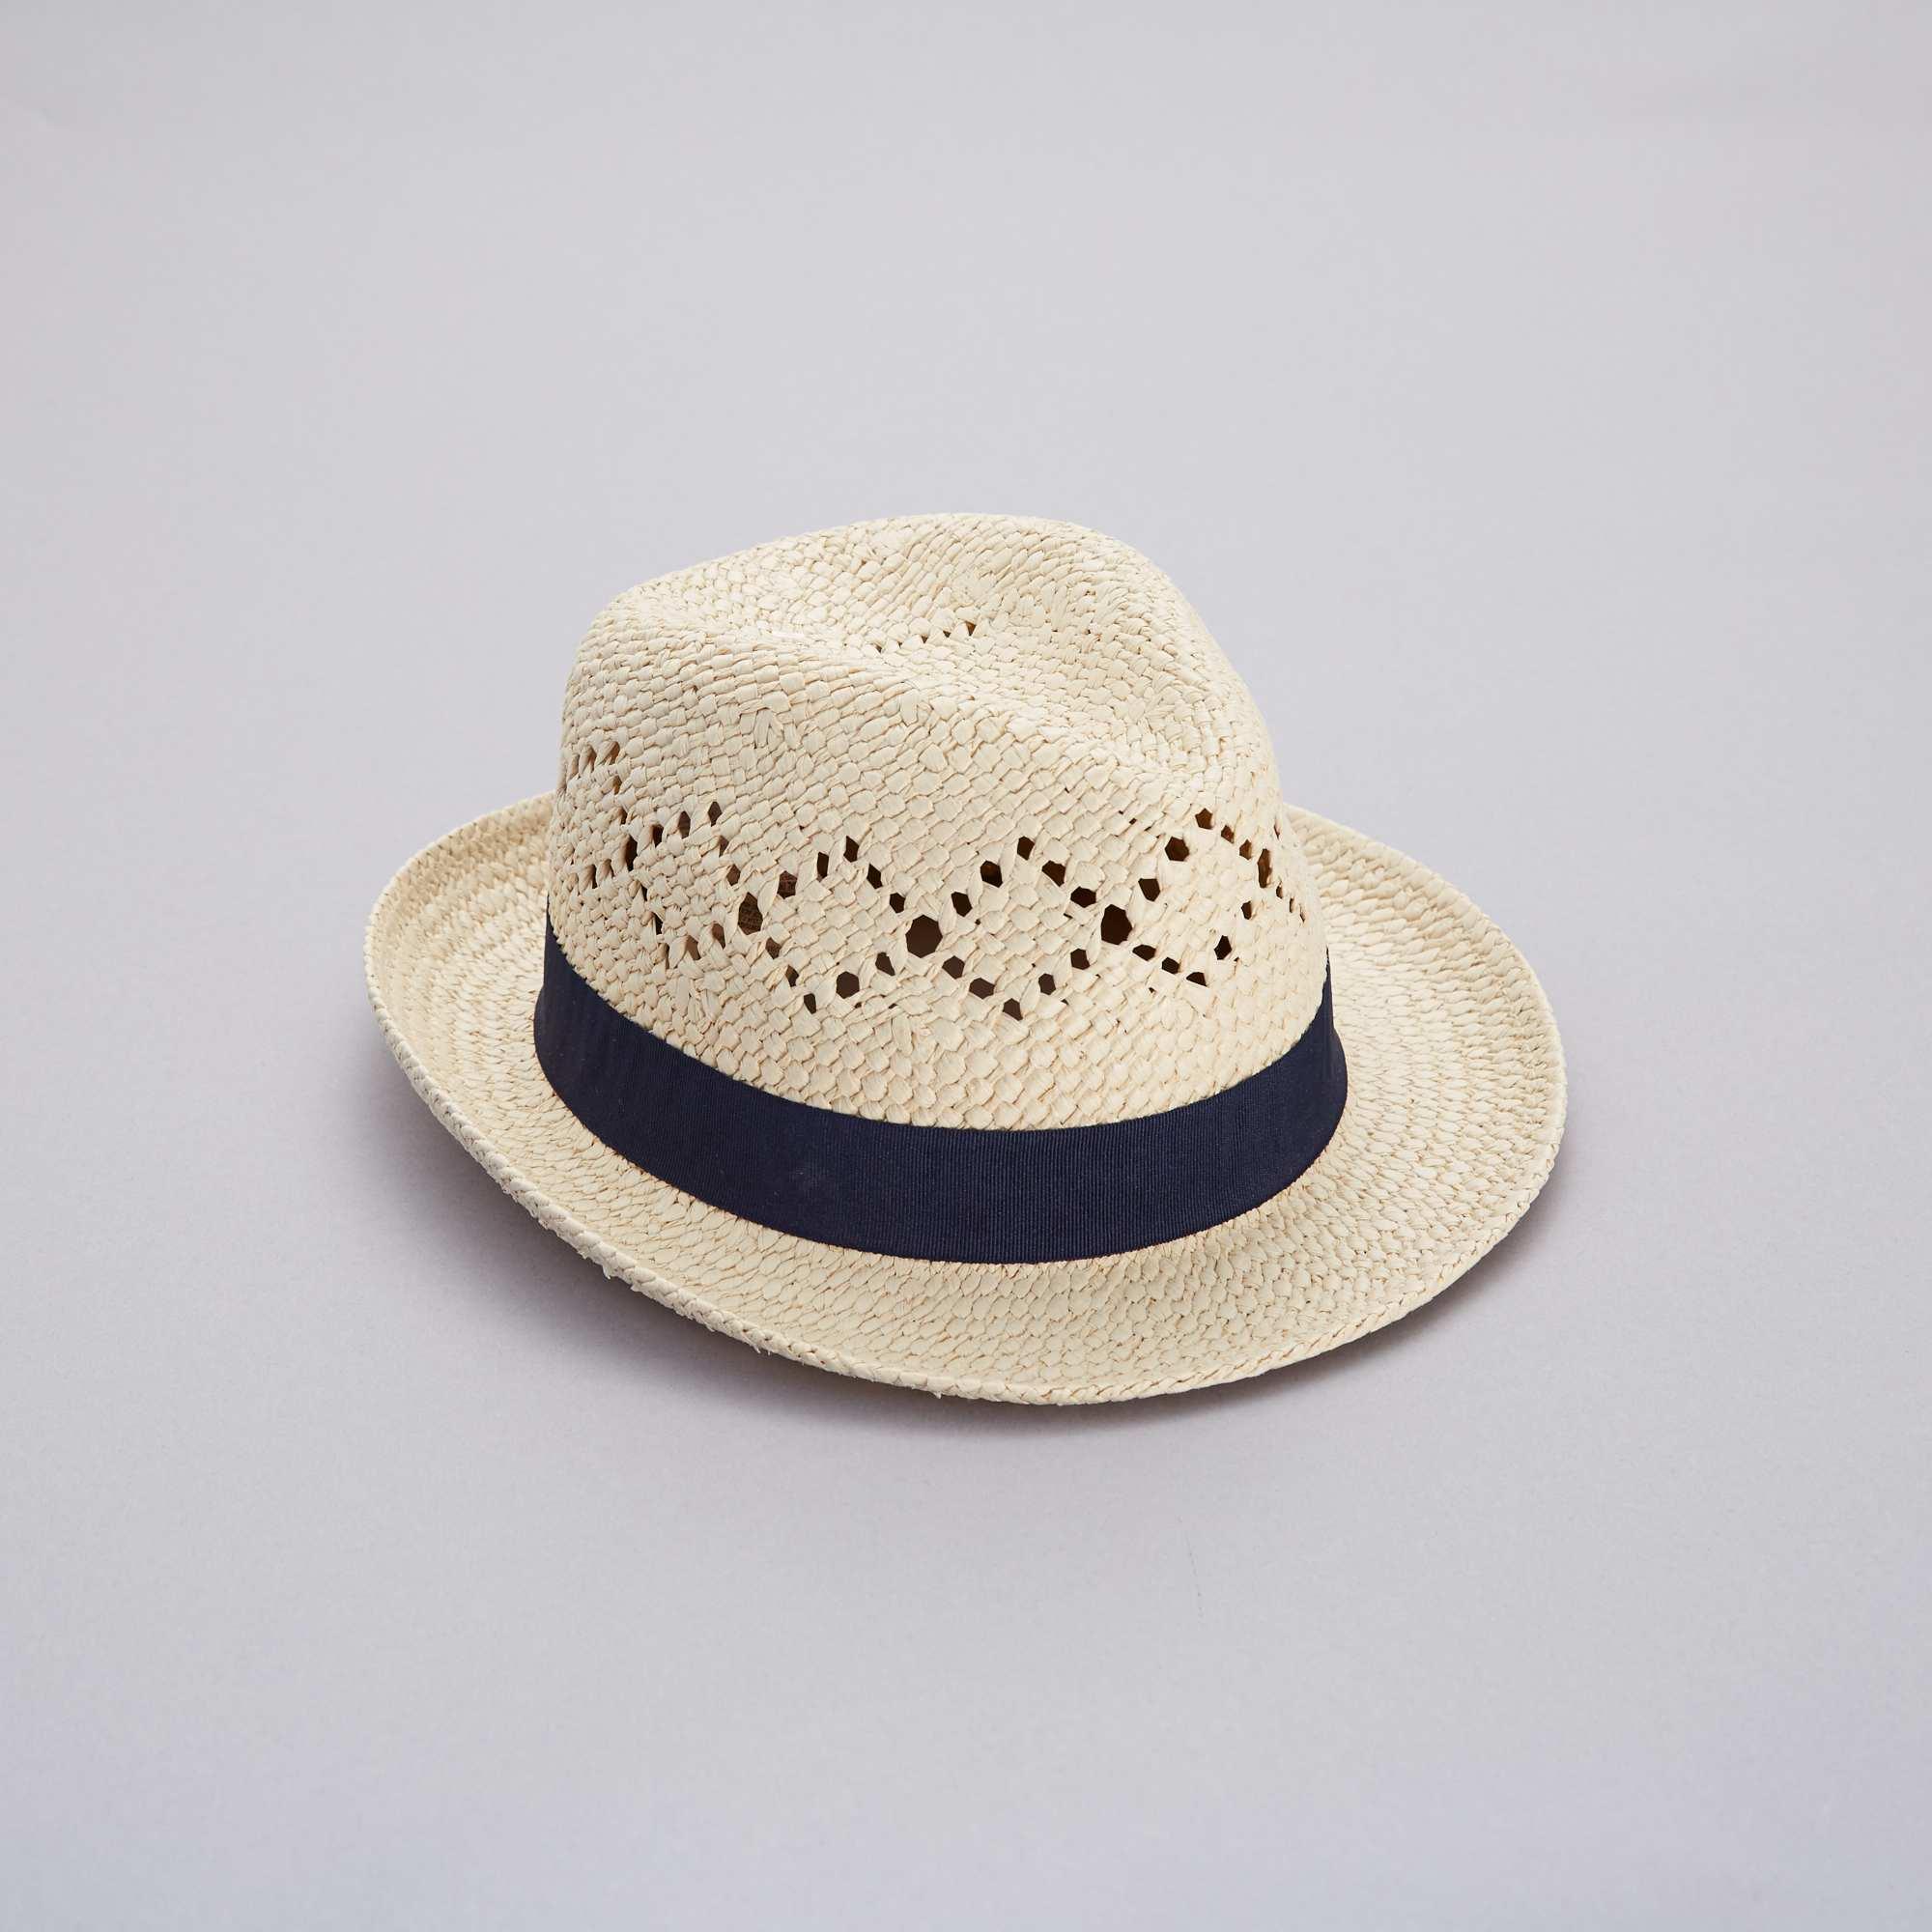 Sombrero borsalino de paja Mujer talla 34 a 48 - azul navy - Kiabi ... 7f2f1b7da8f